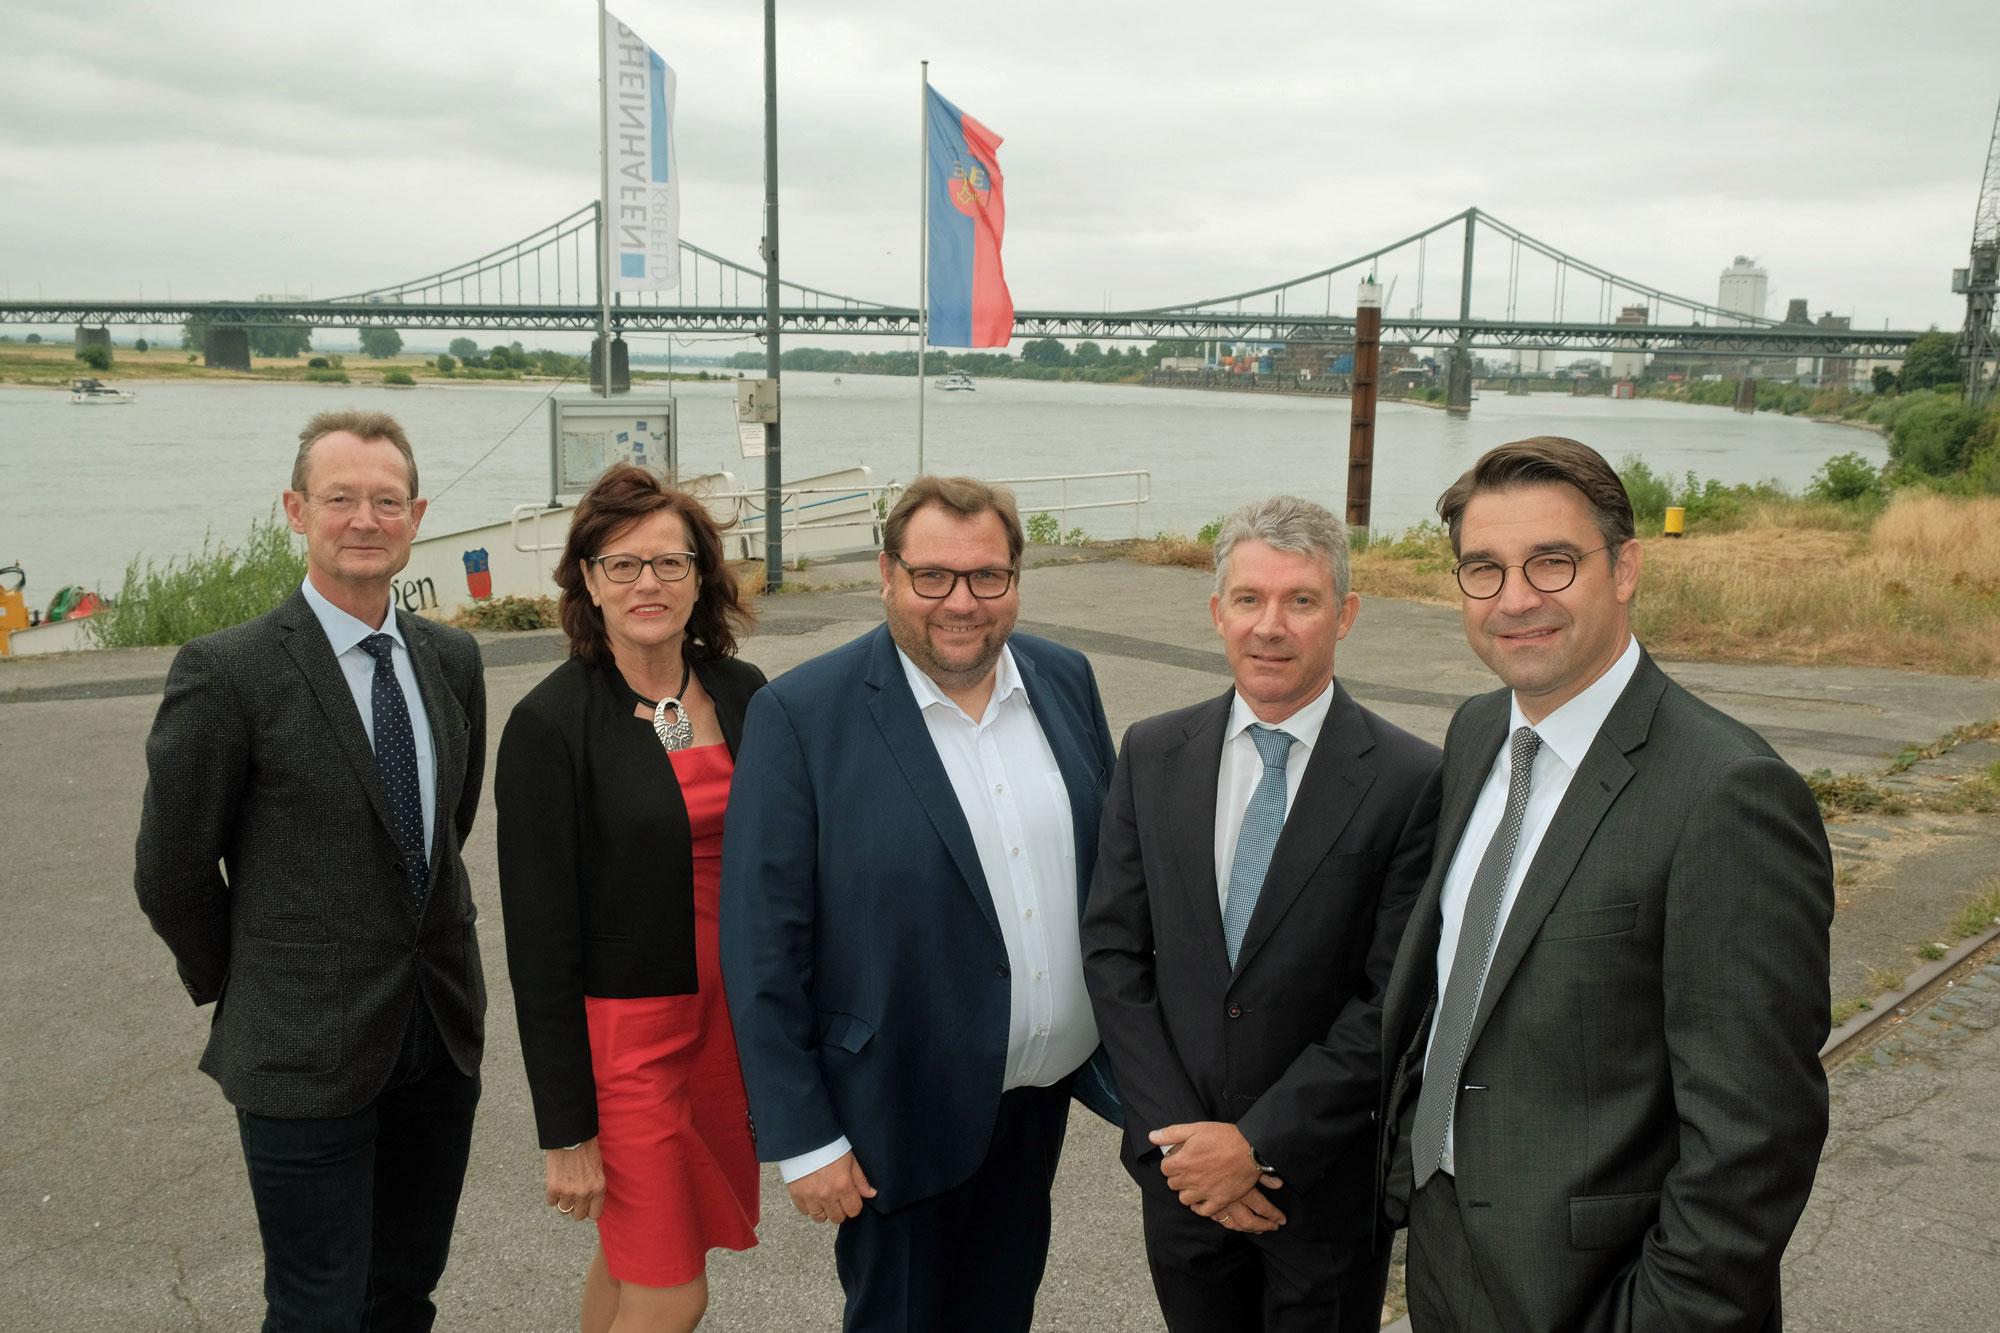 Wechsel an der Spitze der Hafengesellschaft